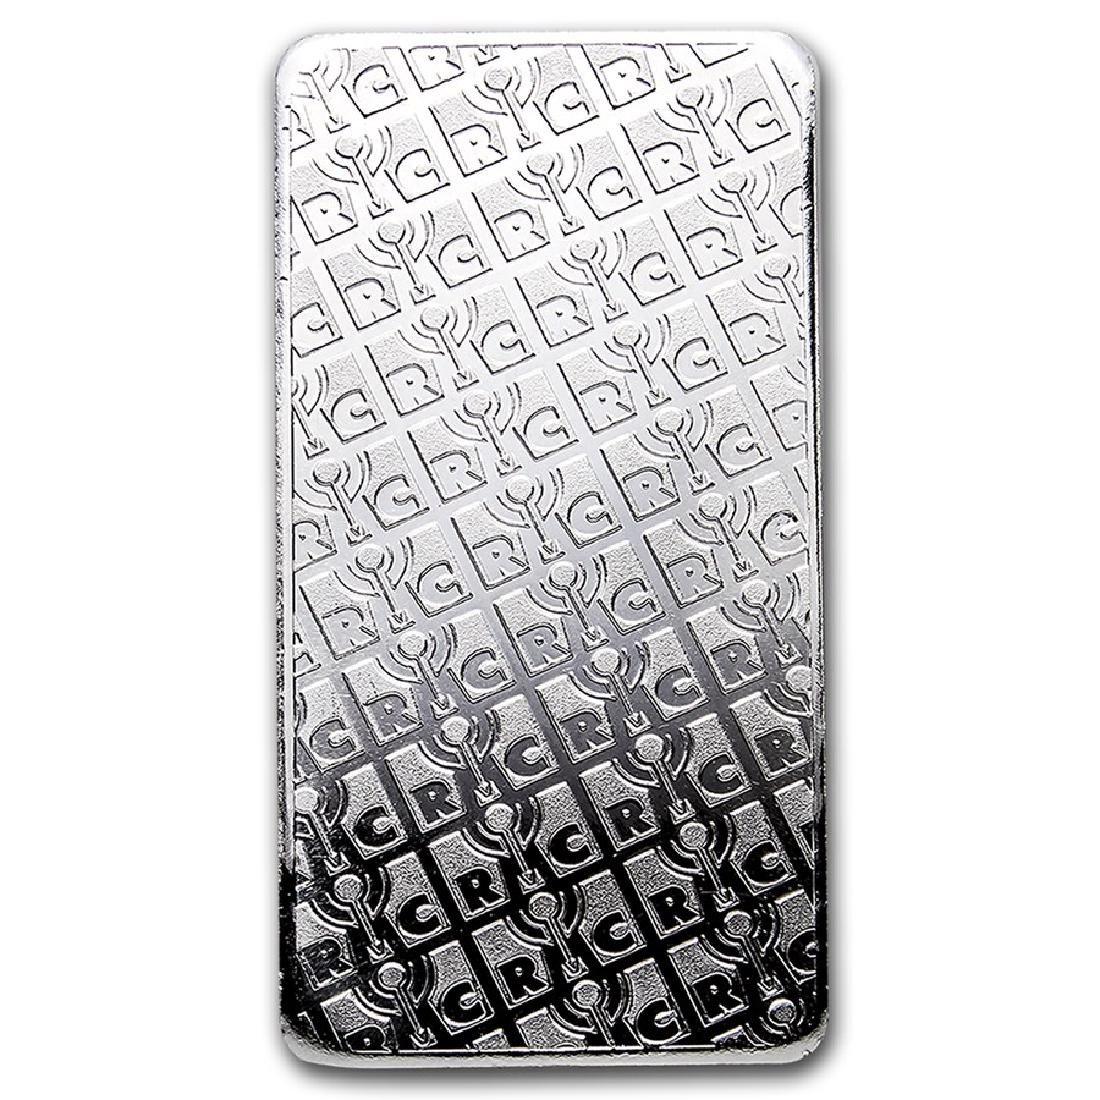 Genuine 10 oz 0.999 Fine Silver Bar - Republic Metals - 2